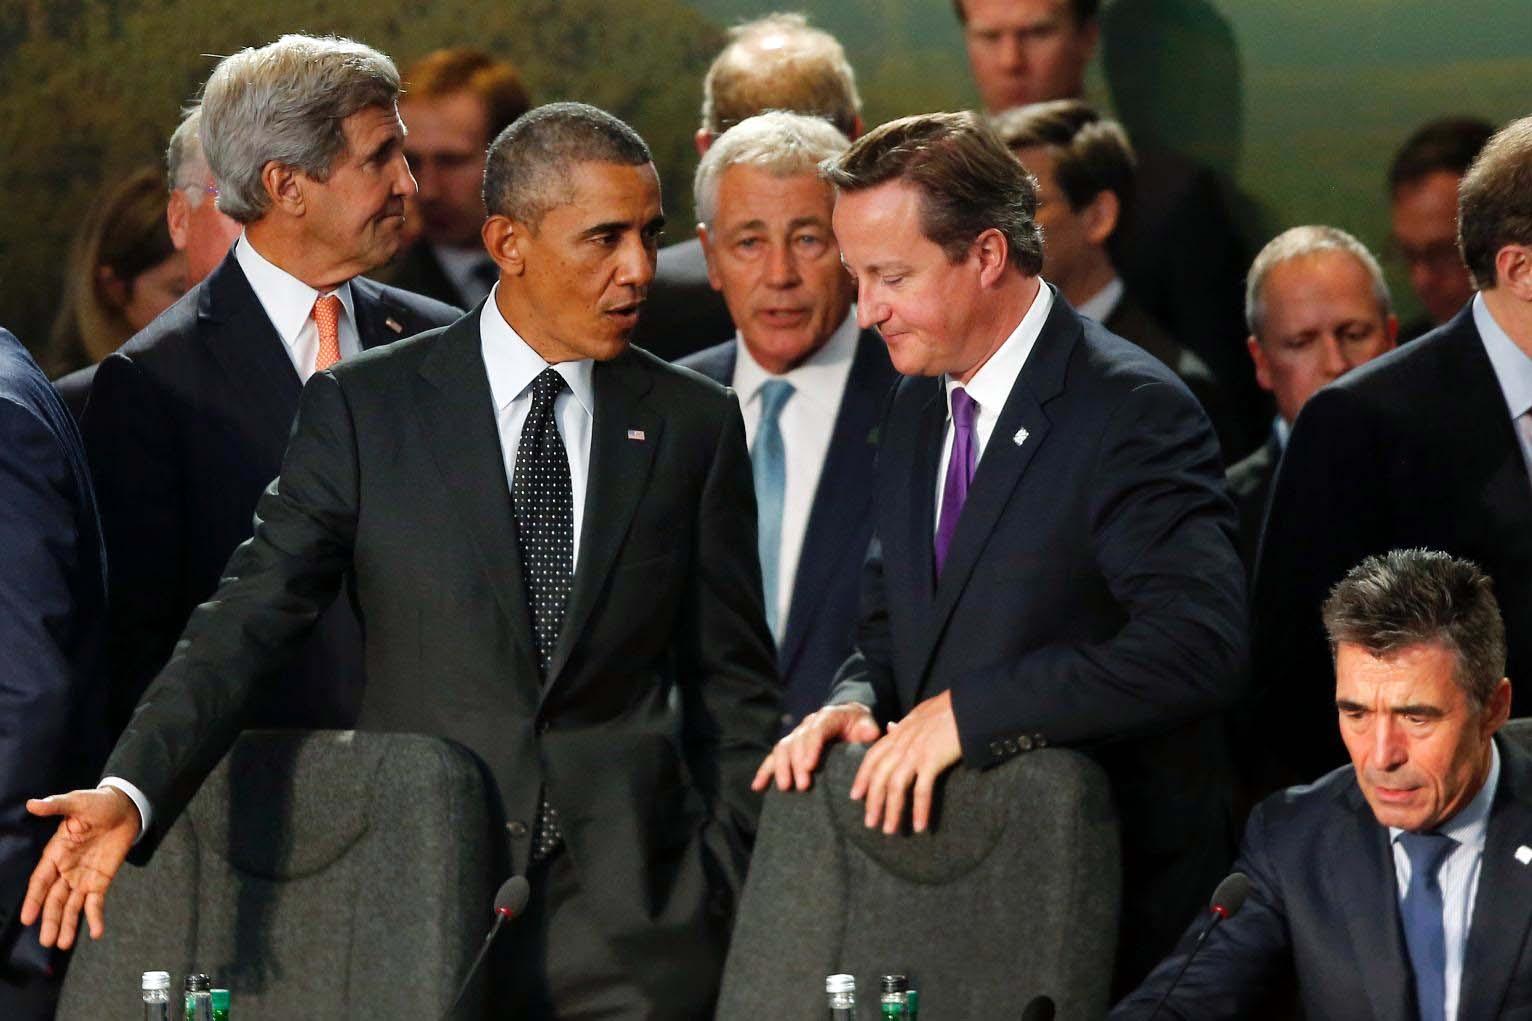 Cameron meets Obama